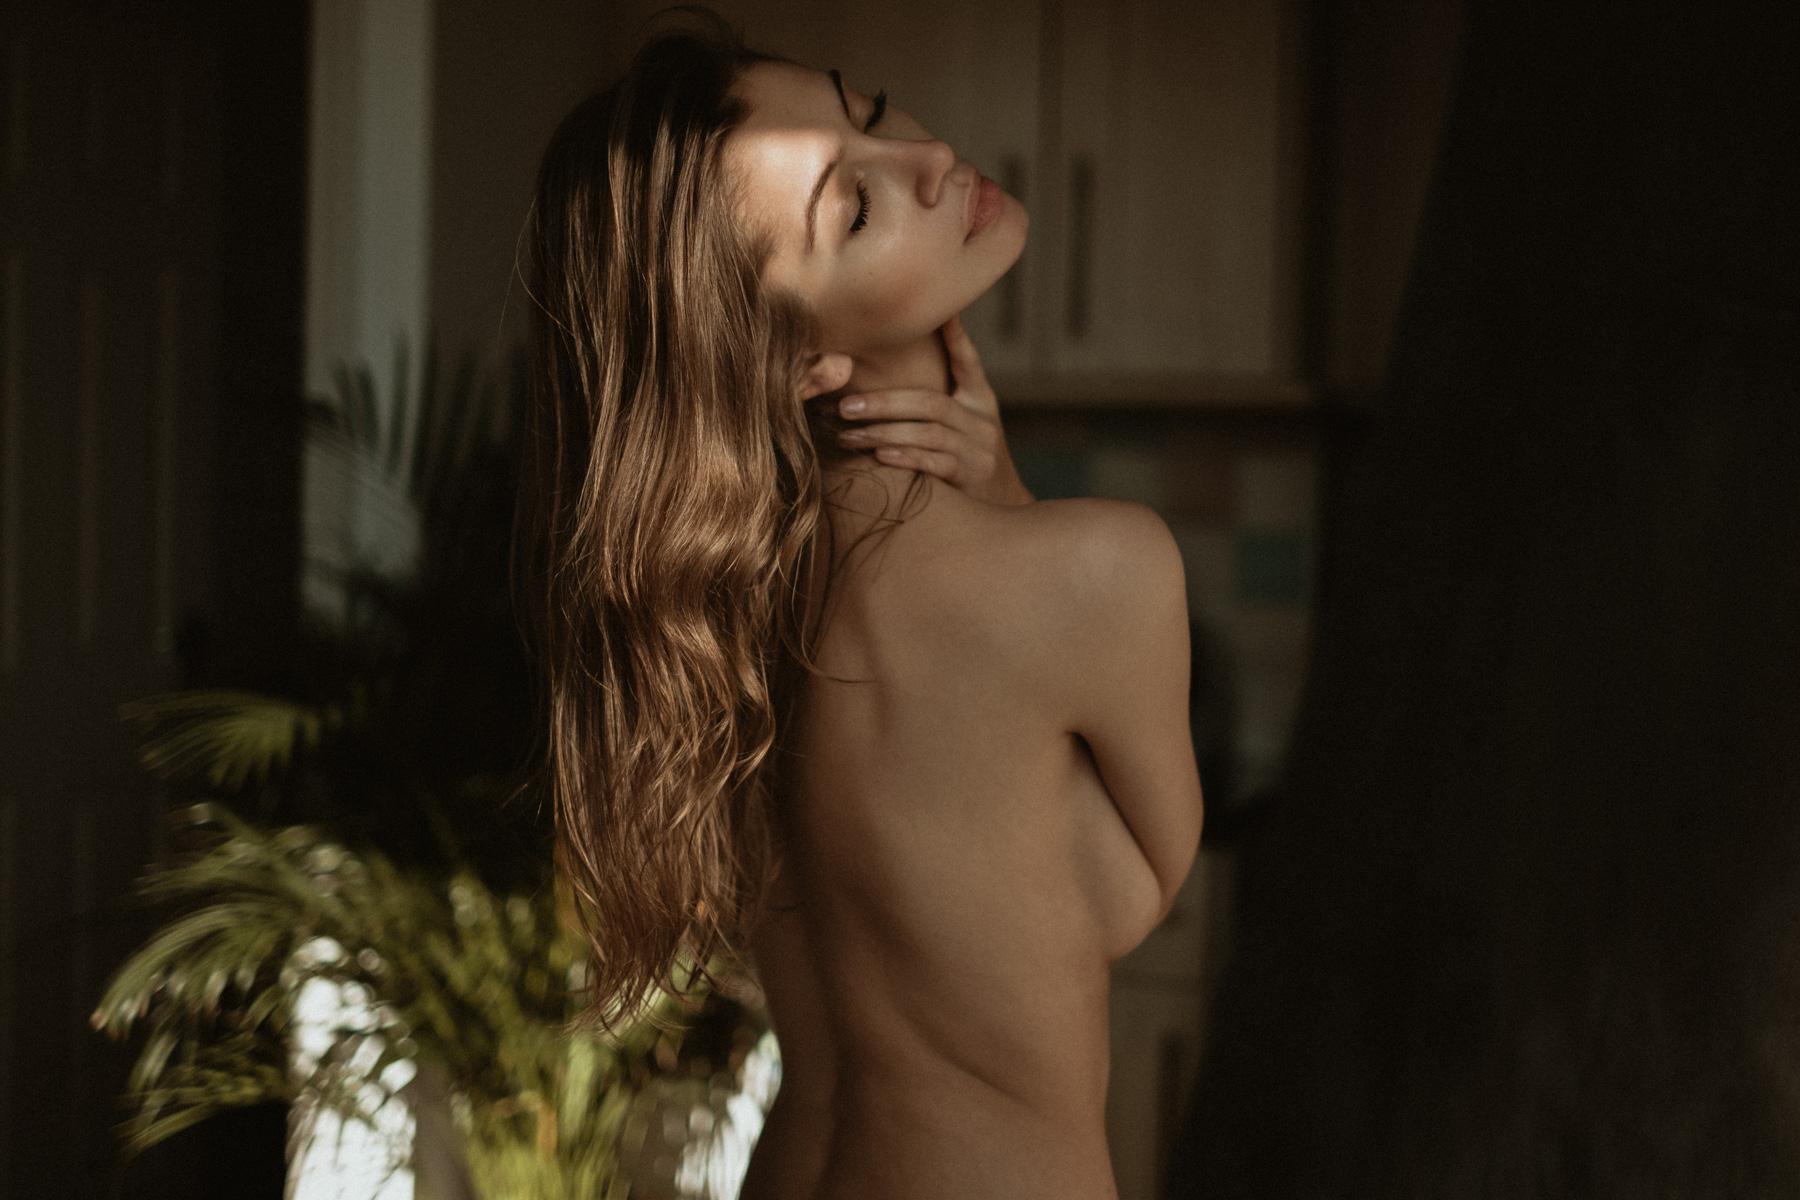 Ludwika_by_Dawid_Imach 24_.jpg